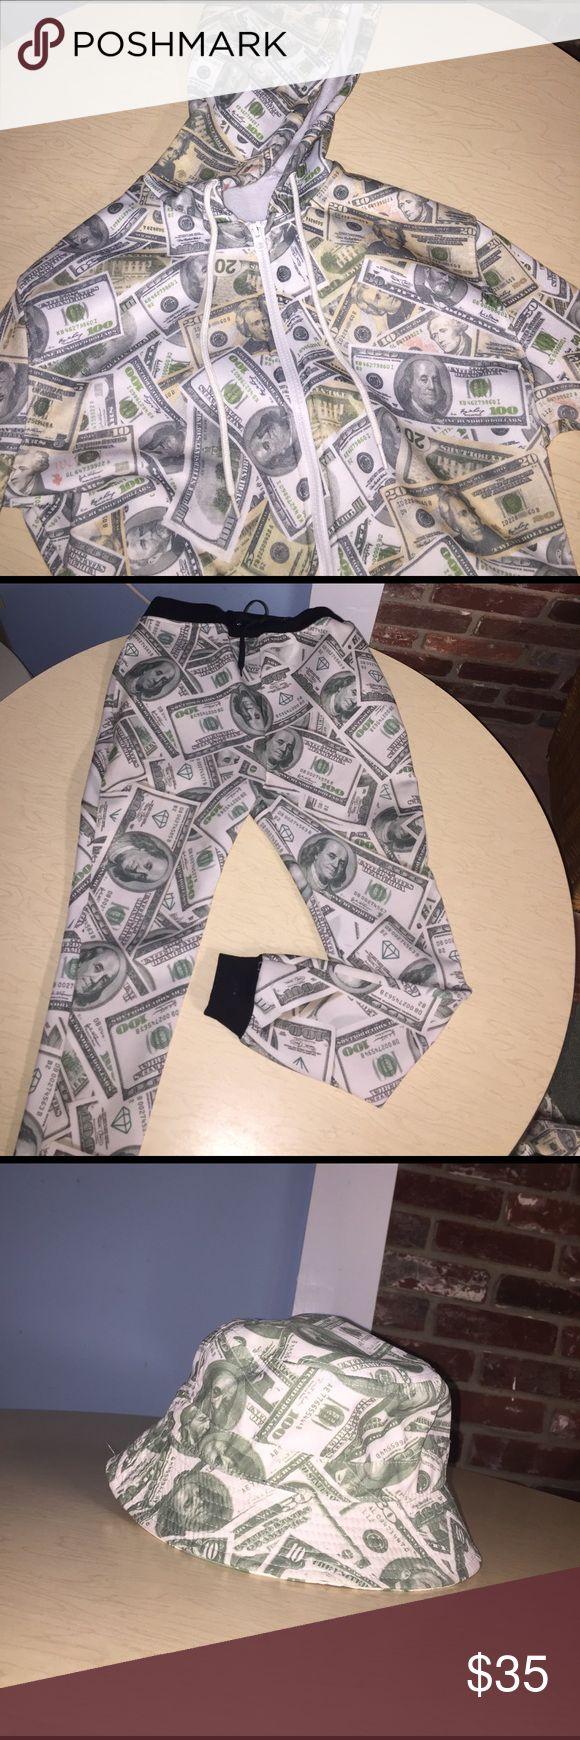 Money joggers 💰 brand new 🔥 horizon ny Pants Sweatpants & Joggers